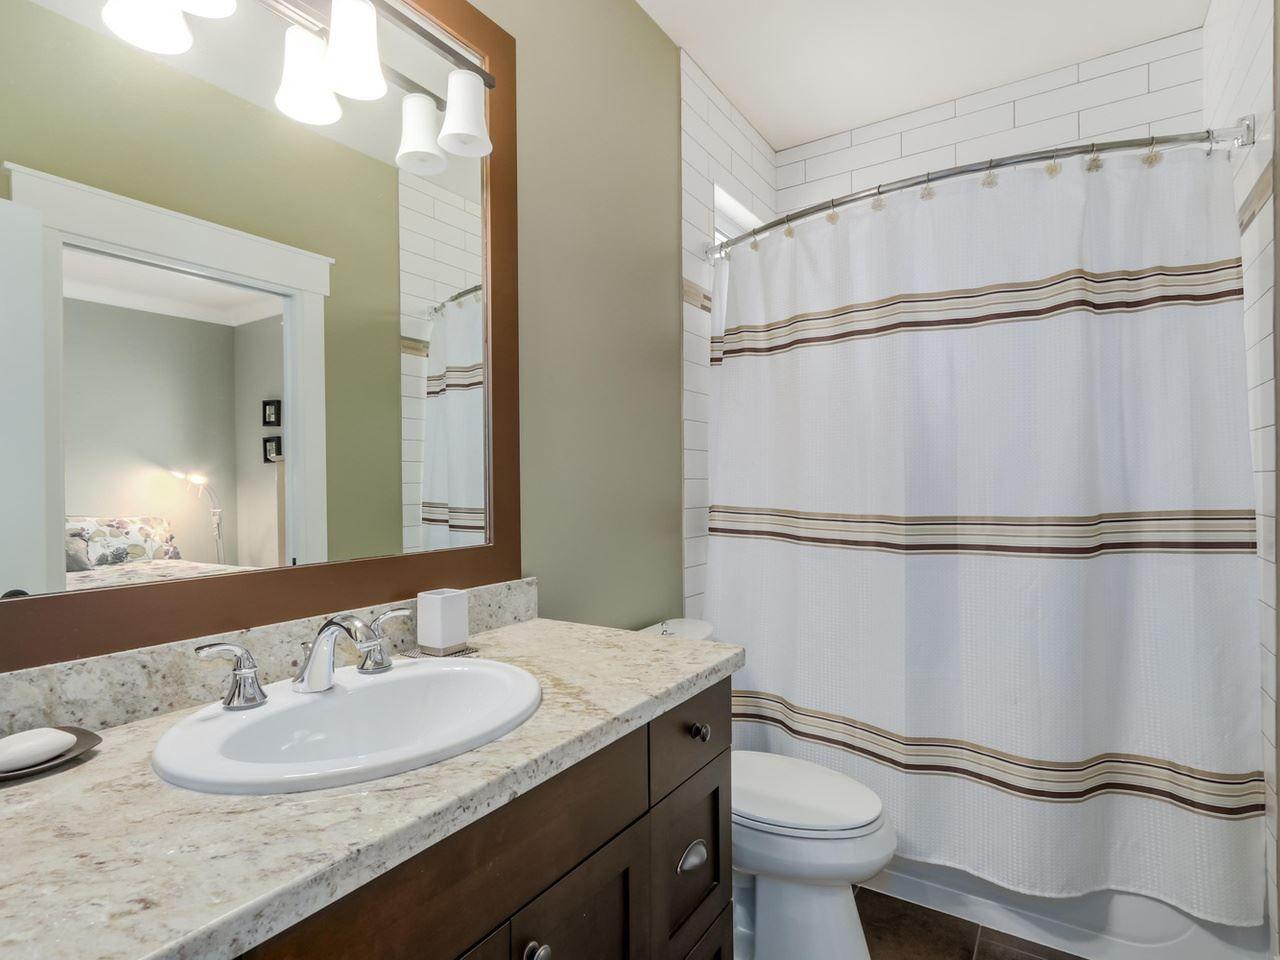 Photo 18: Photos: 13029 14 Avenue in Surrey: Crescent Bch Ocean Pk. House for sale (South Surrey White Rock)  : MLS®# R2070160